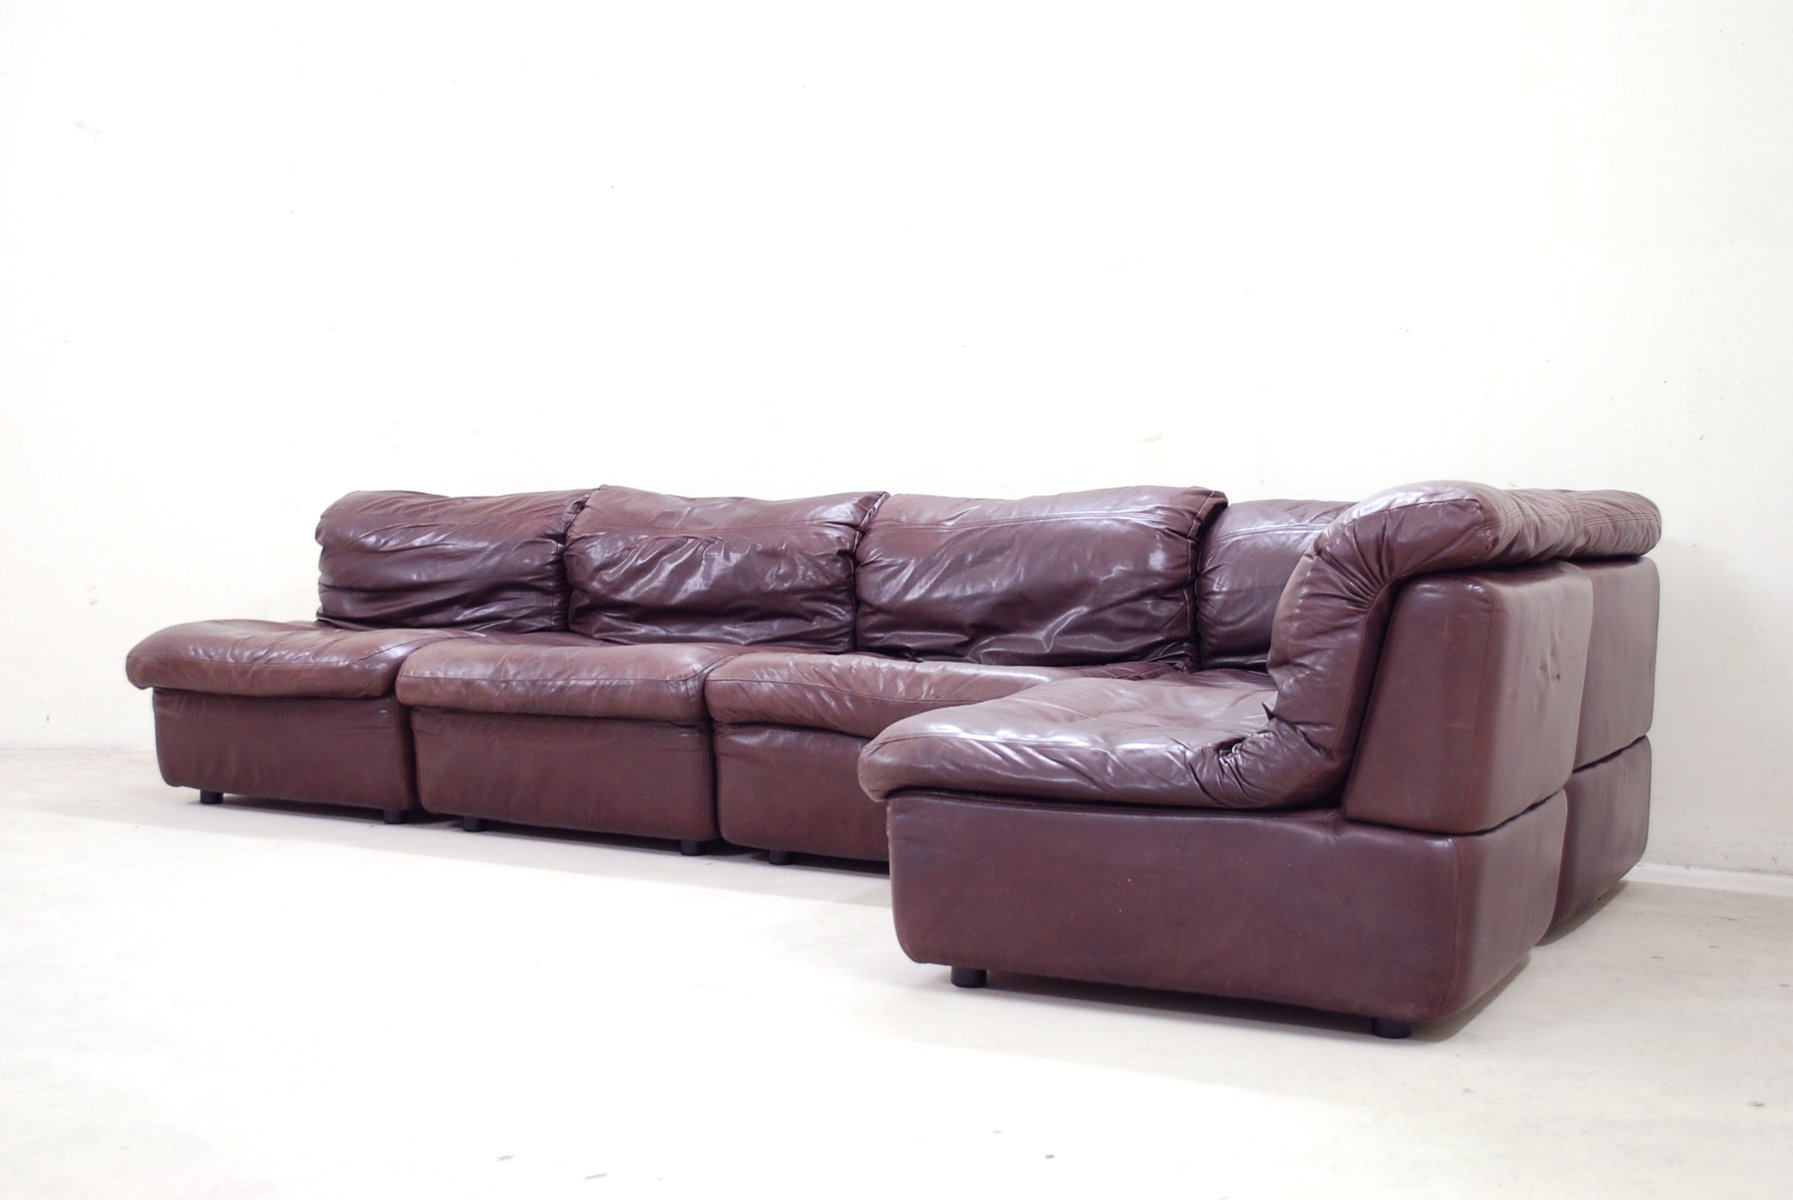 modulares bordeaux ledersofa von rolf benz 1985 bei pamono kaufen. Black Bedroom Furniture Sets. Home Design Ideas